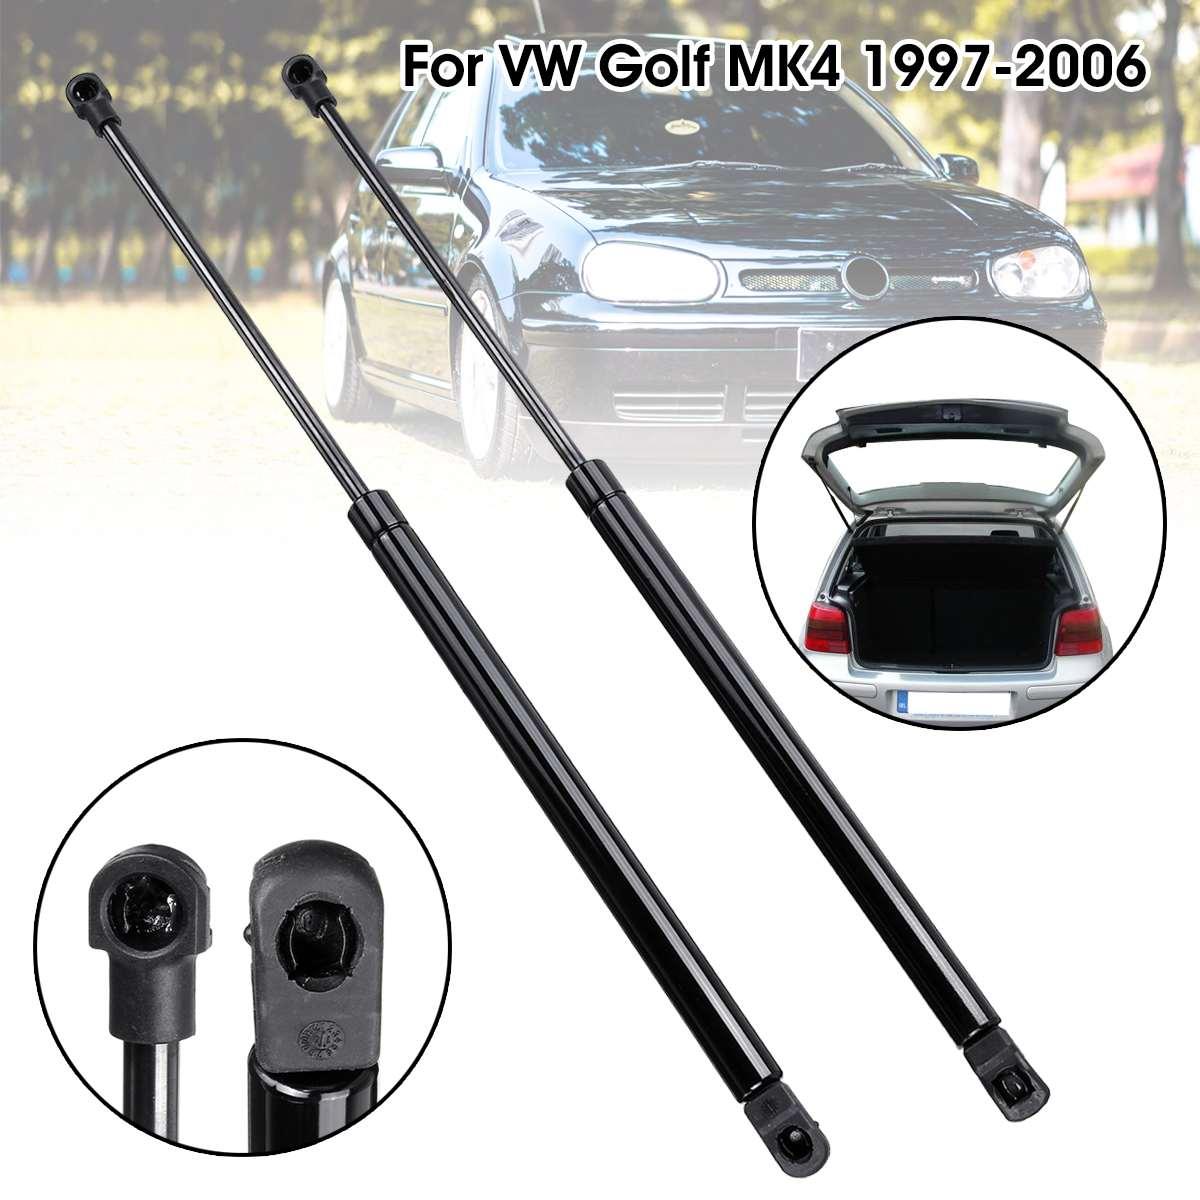 1Pair Rear Trunk Tail Lift Supports Gas Strut Rod Arm Shocks Strut Bars Damper For VW Golf MK4 1997 - 2006 Estate 1J6827550